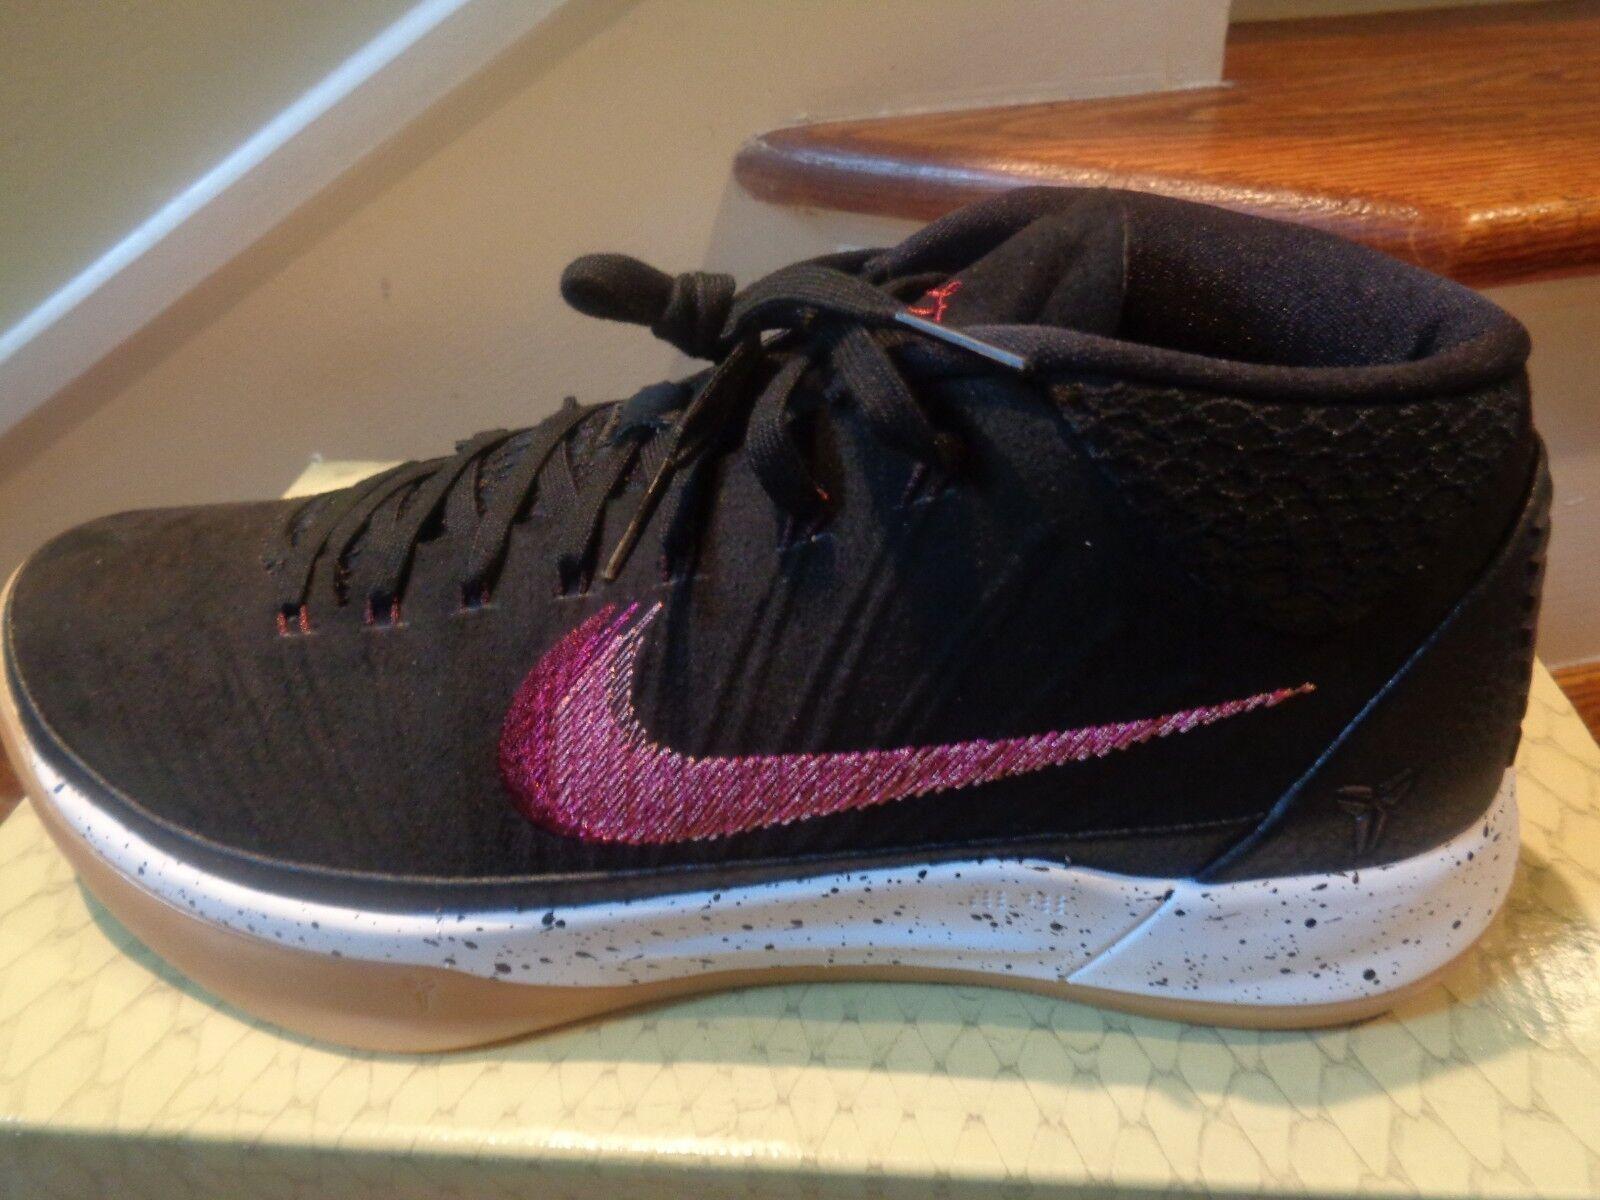 Nike Kobe AD Mid Men's Men's Basketball shoes, 922482 006 Size 9 NWB